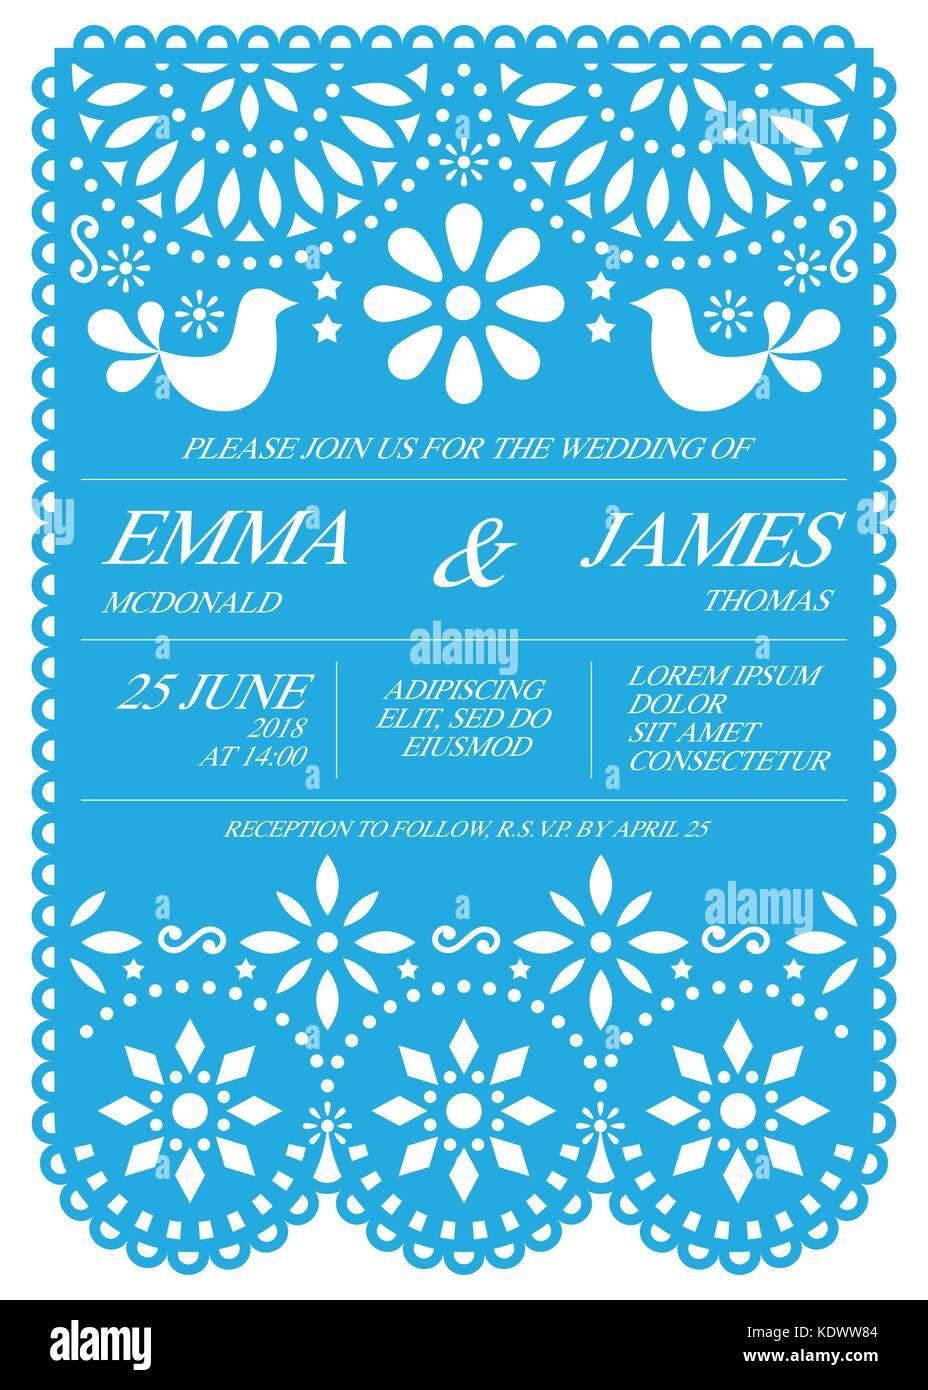 Wedding Invitation Vector Card Template Mexican Folk Papel Picado